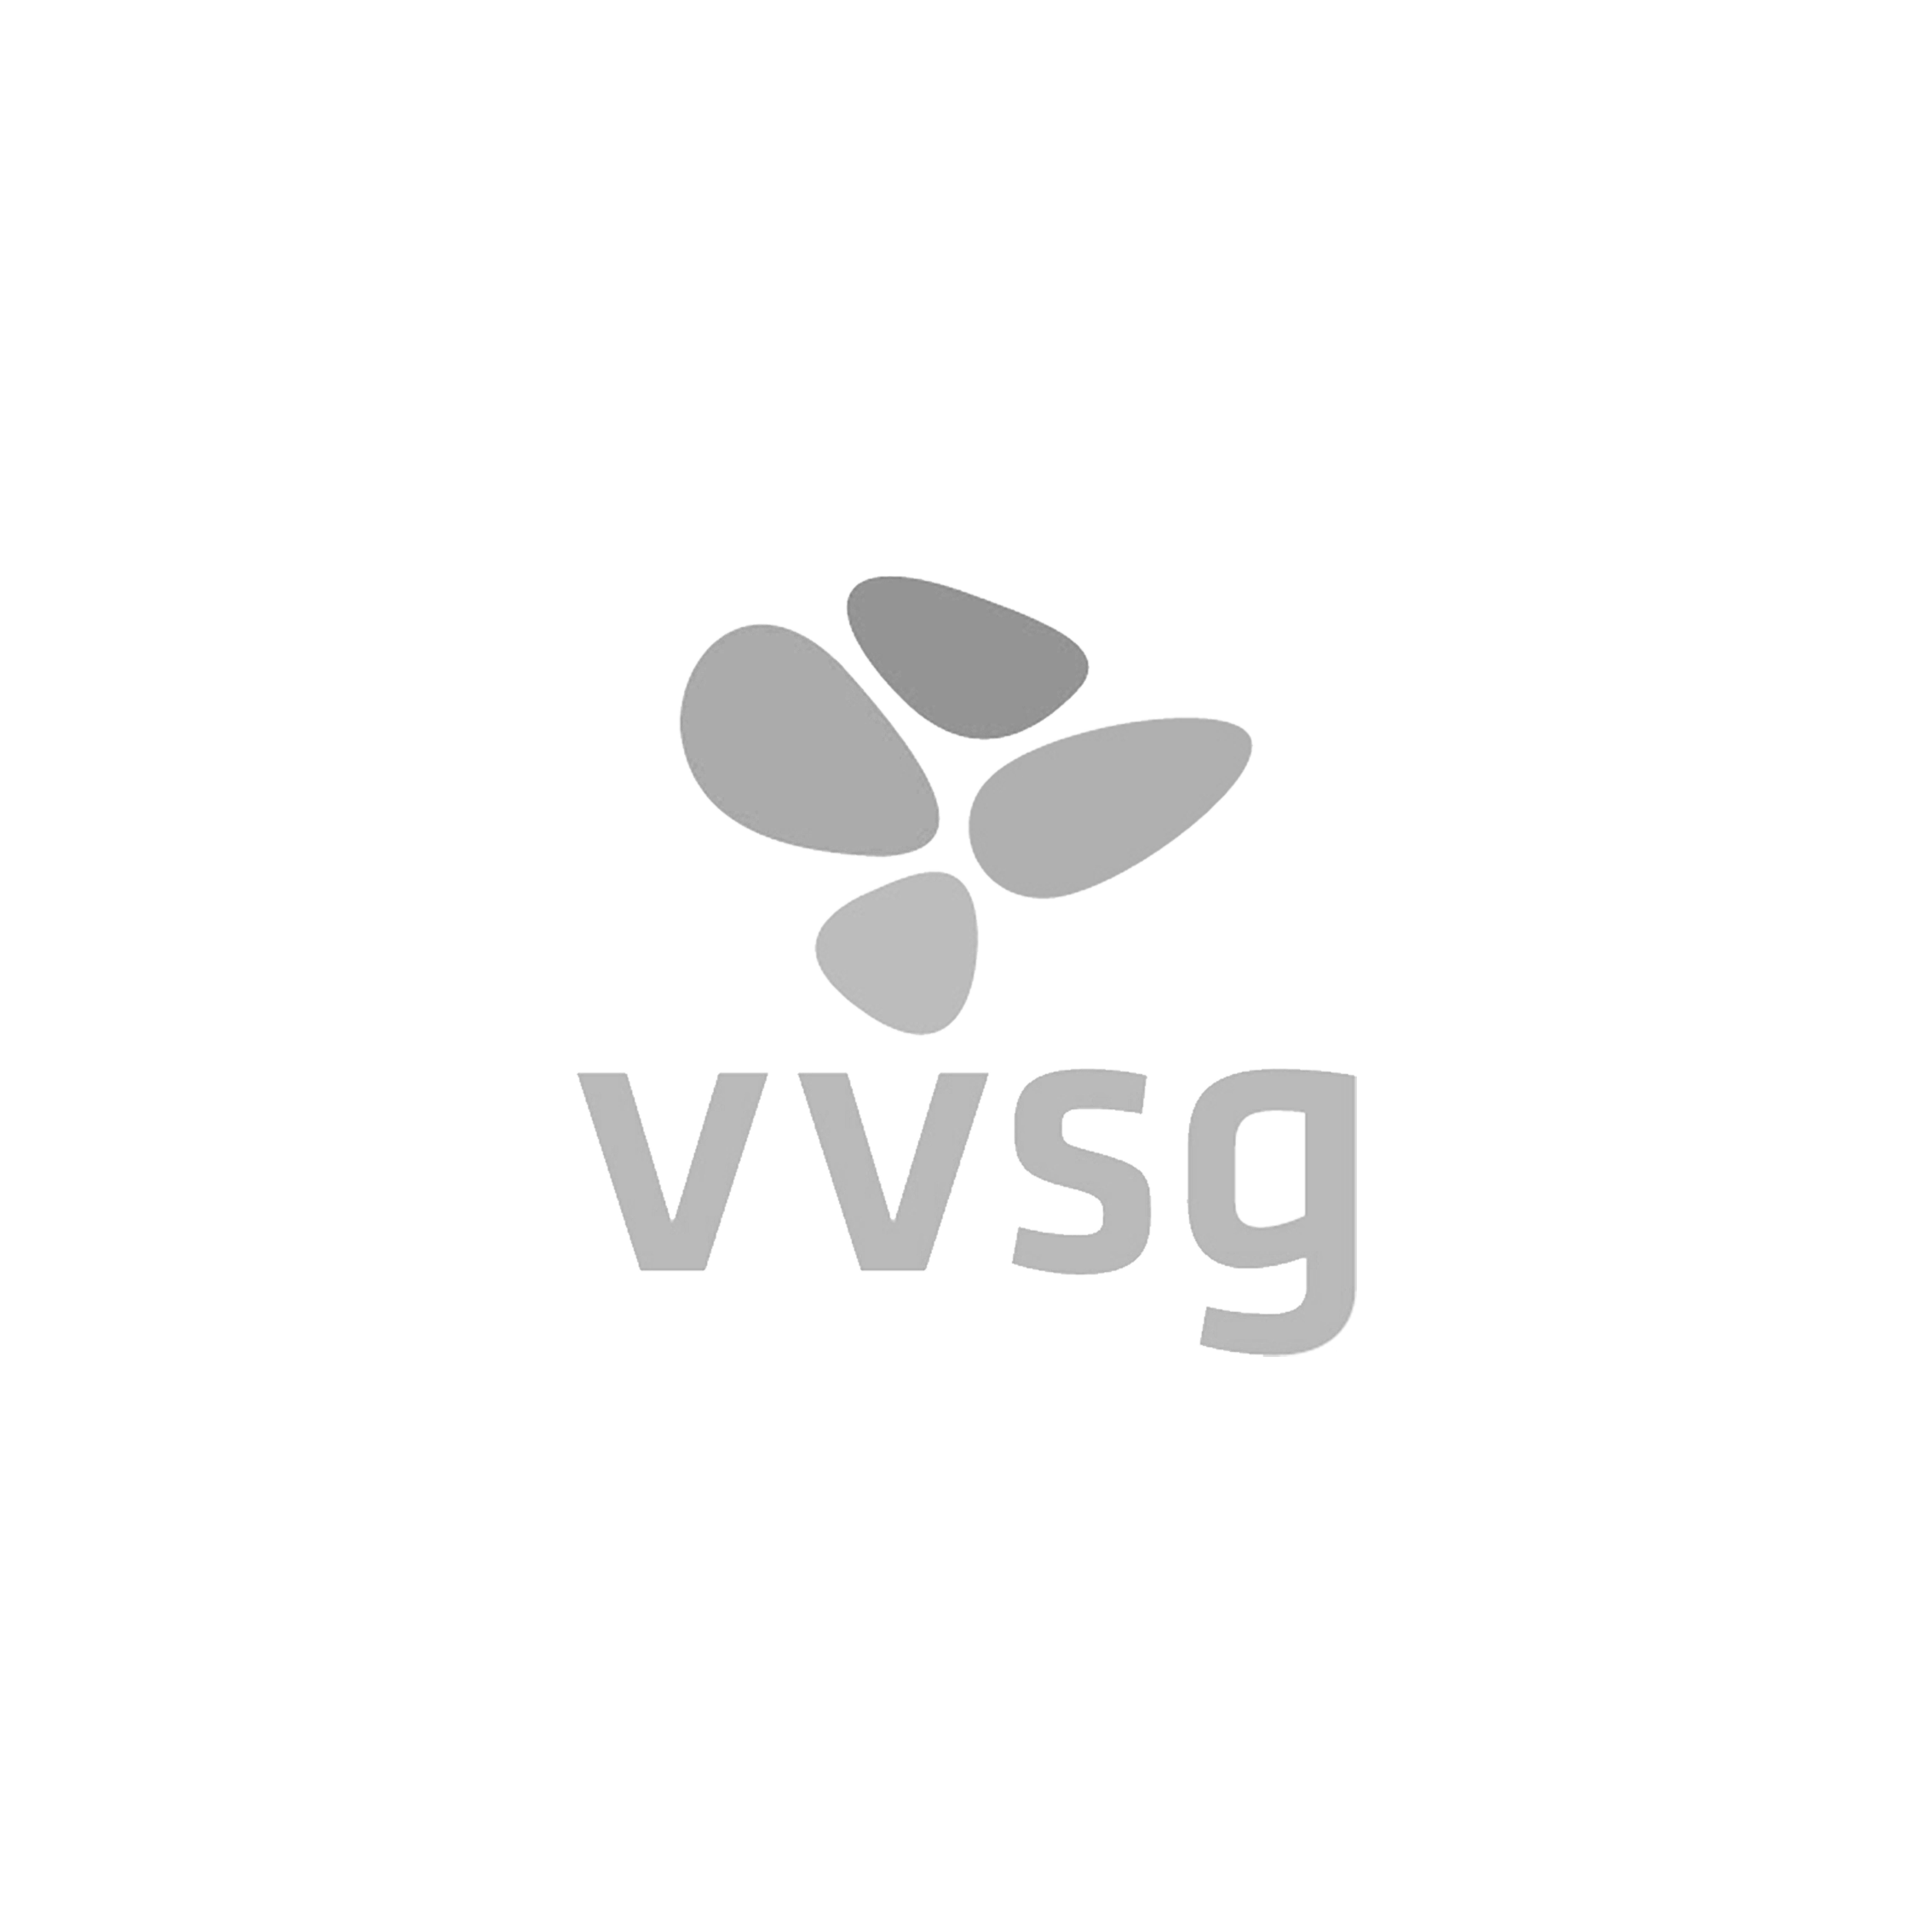 Partners-vvsg-BW.png